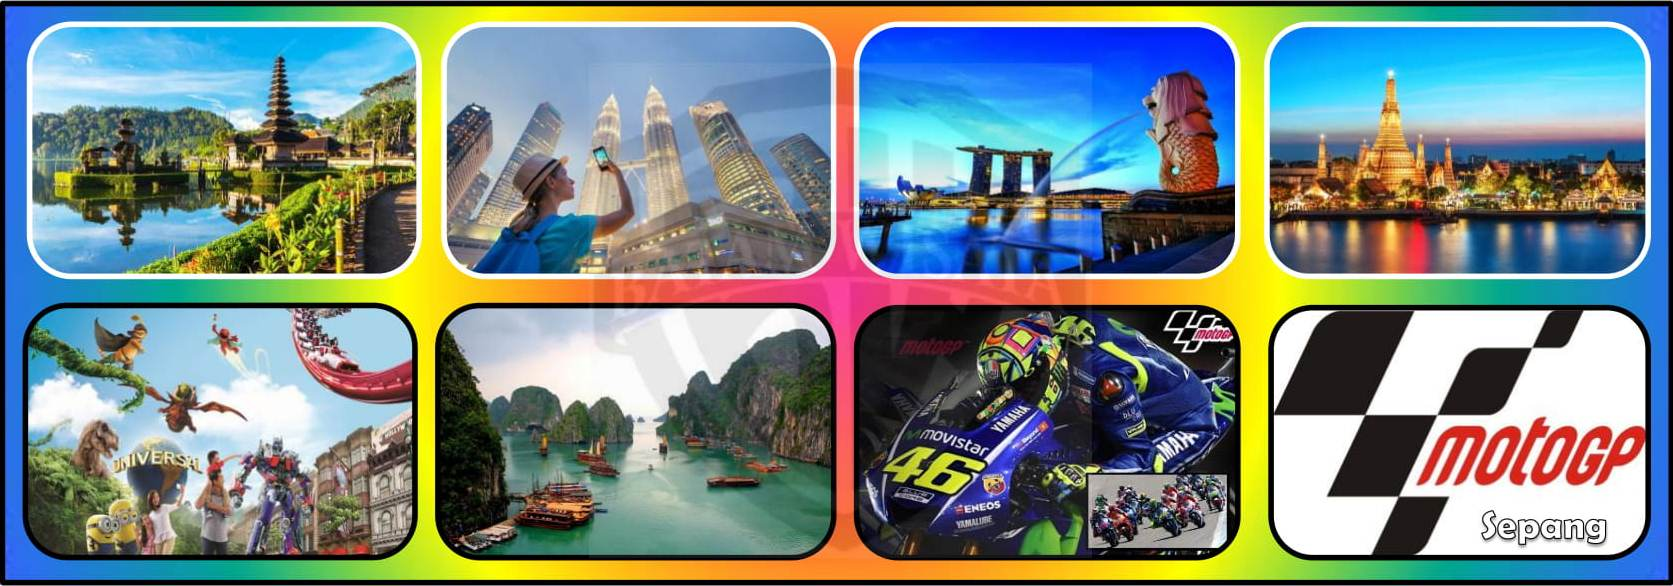 Paket Wisata Batam Singapore Malaysia 4 Hari 3 Malam